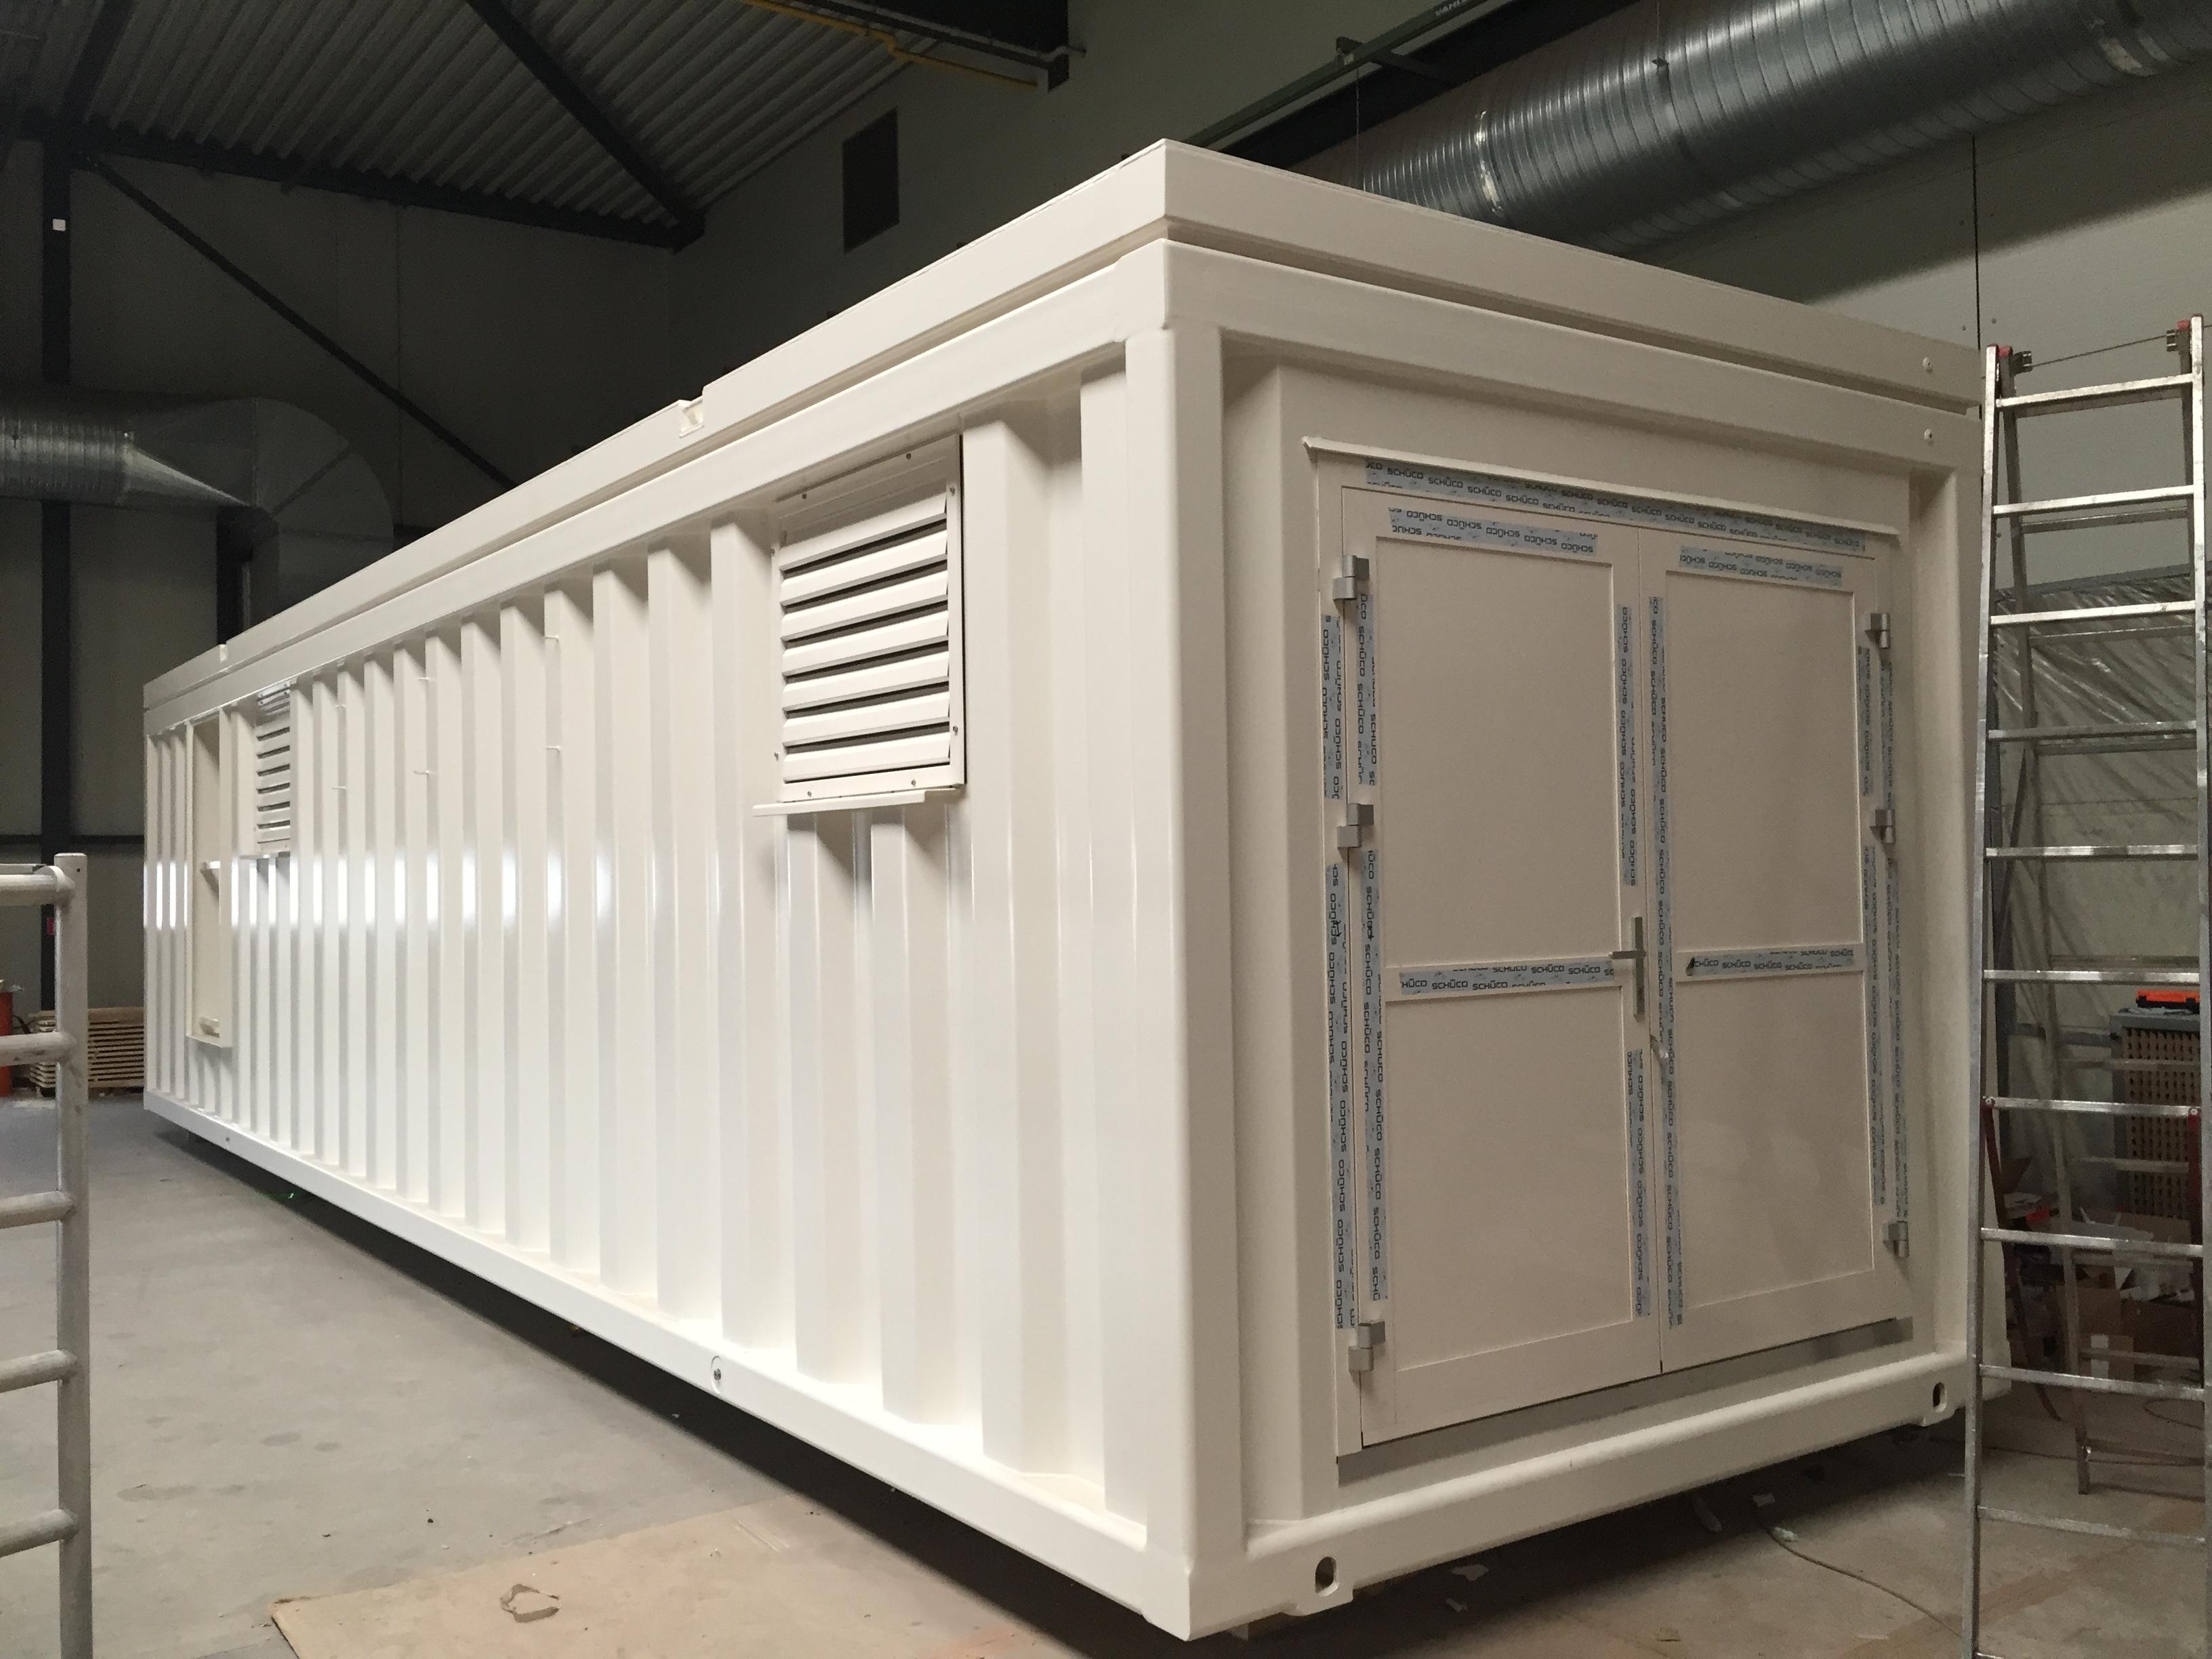 Noodcontainer